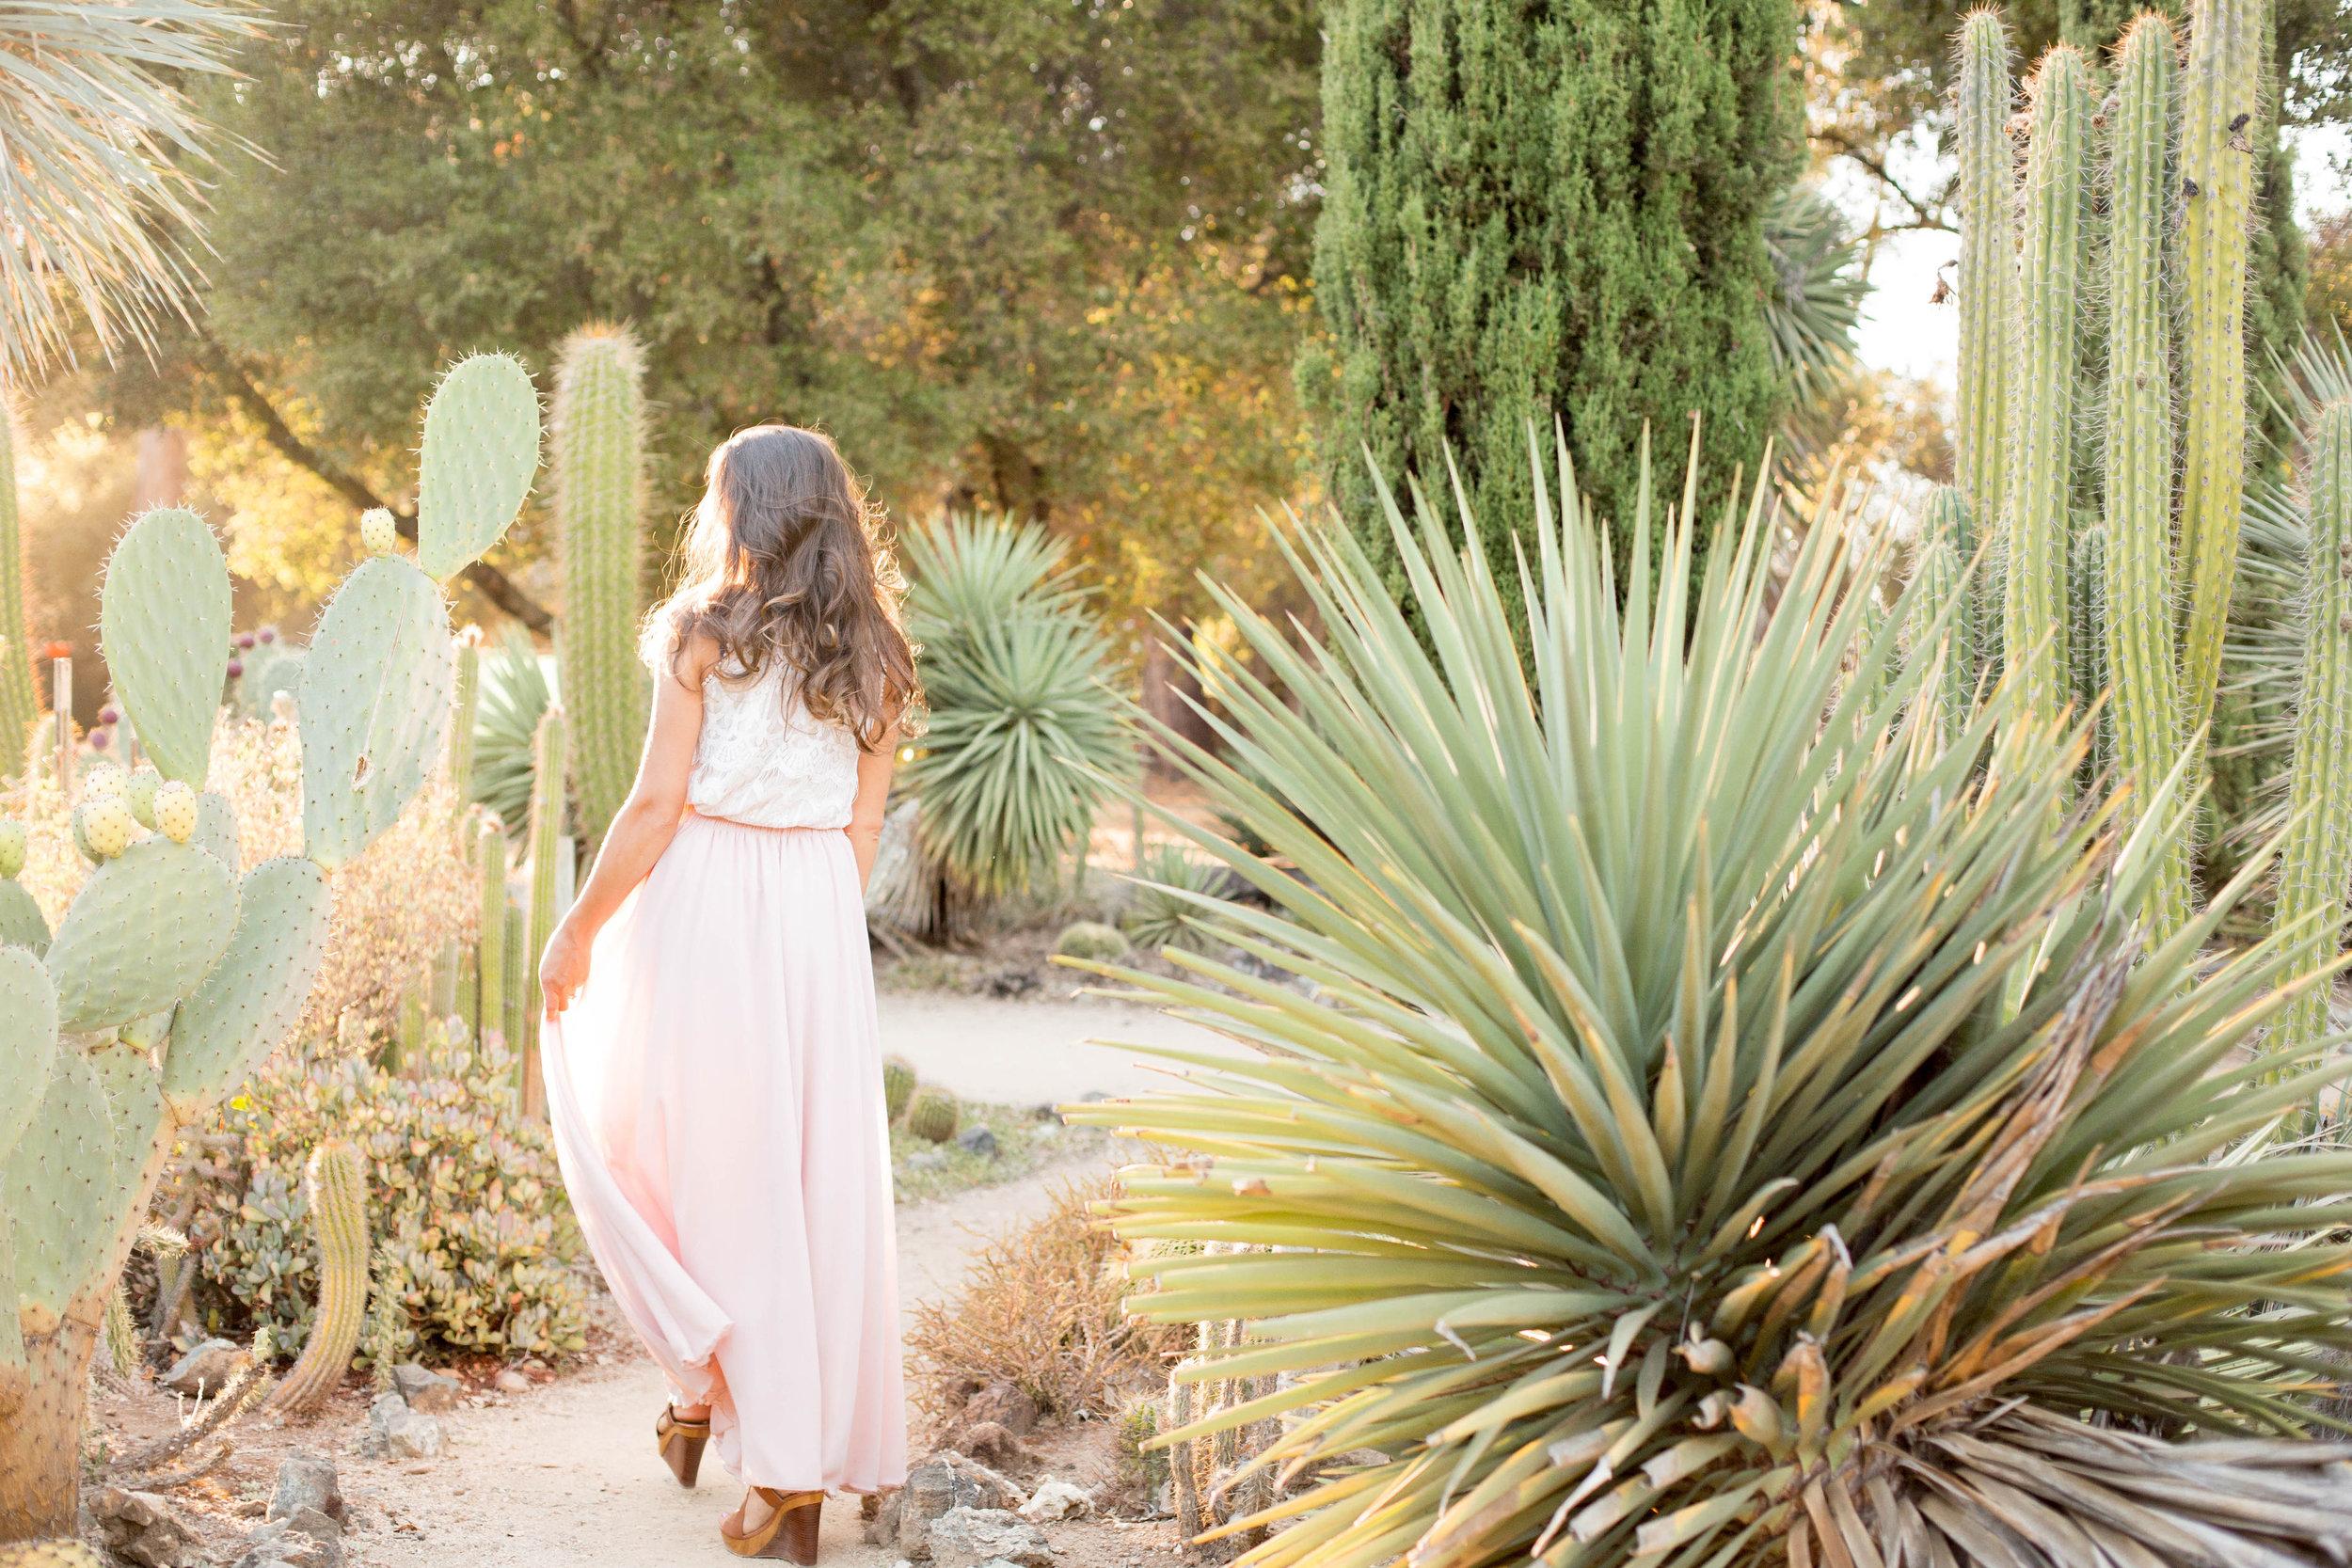 cassandra mcclure_stanford_cactus-garden1193.jpg